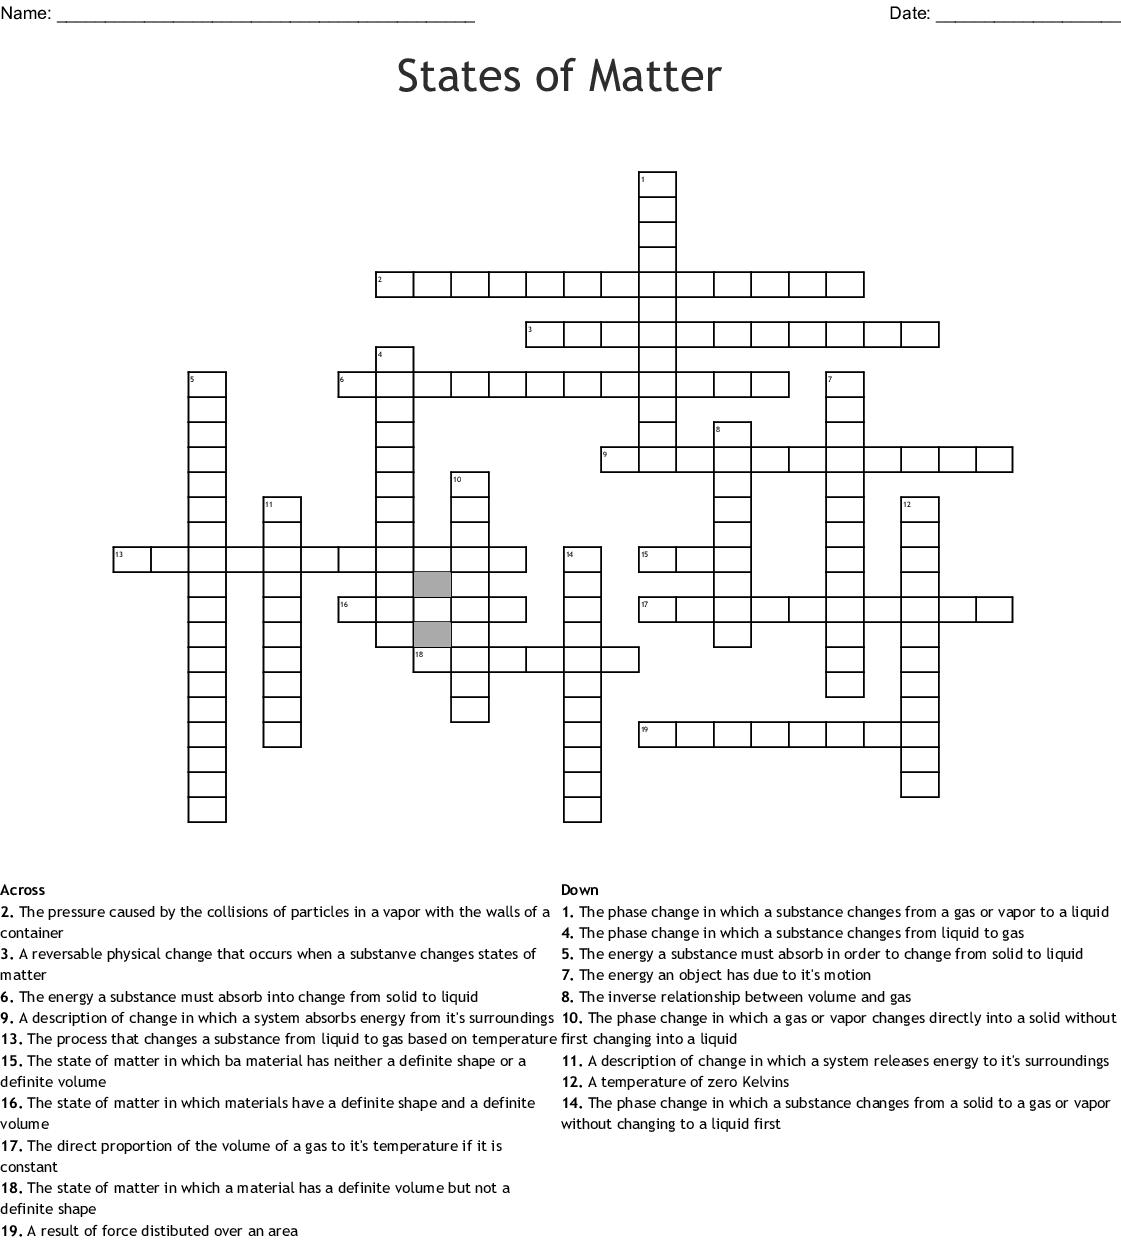 Unit 9 States Of Matter Crossword